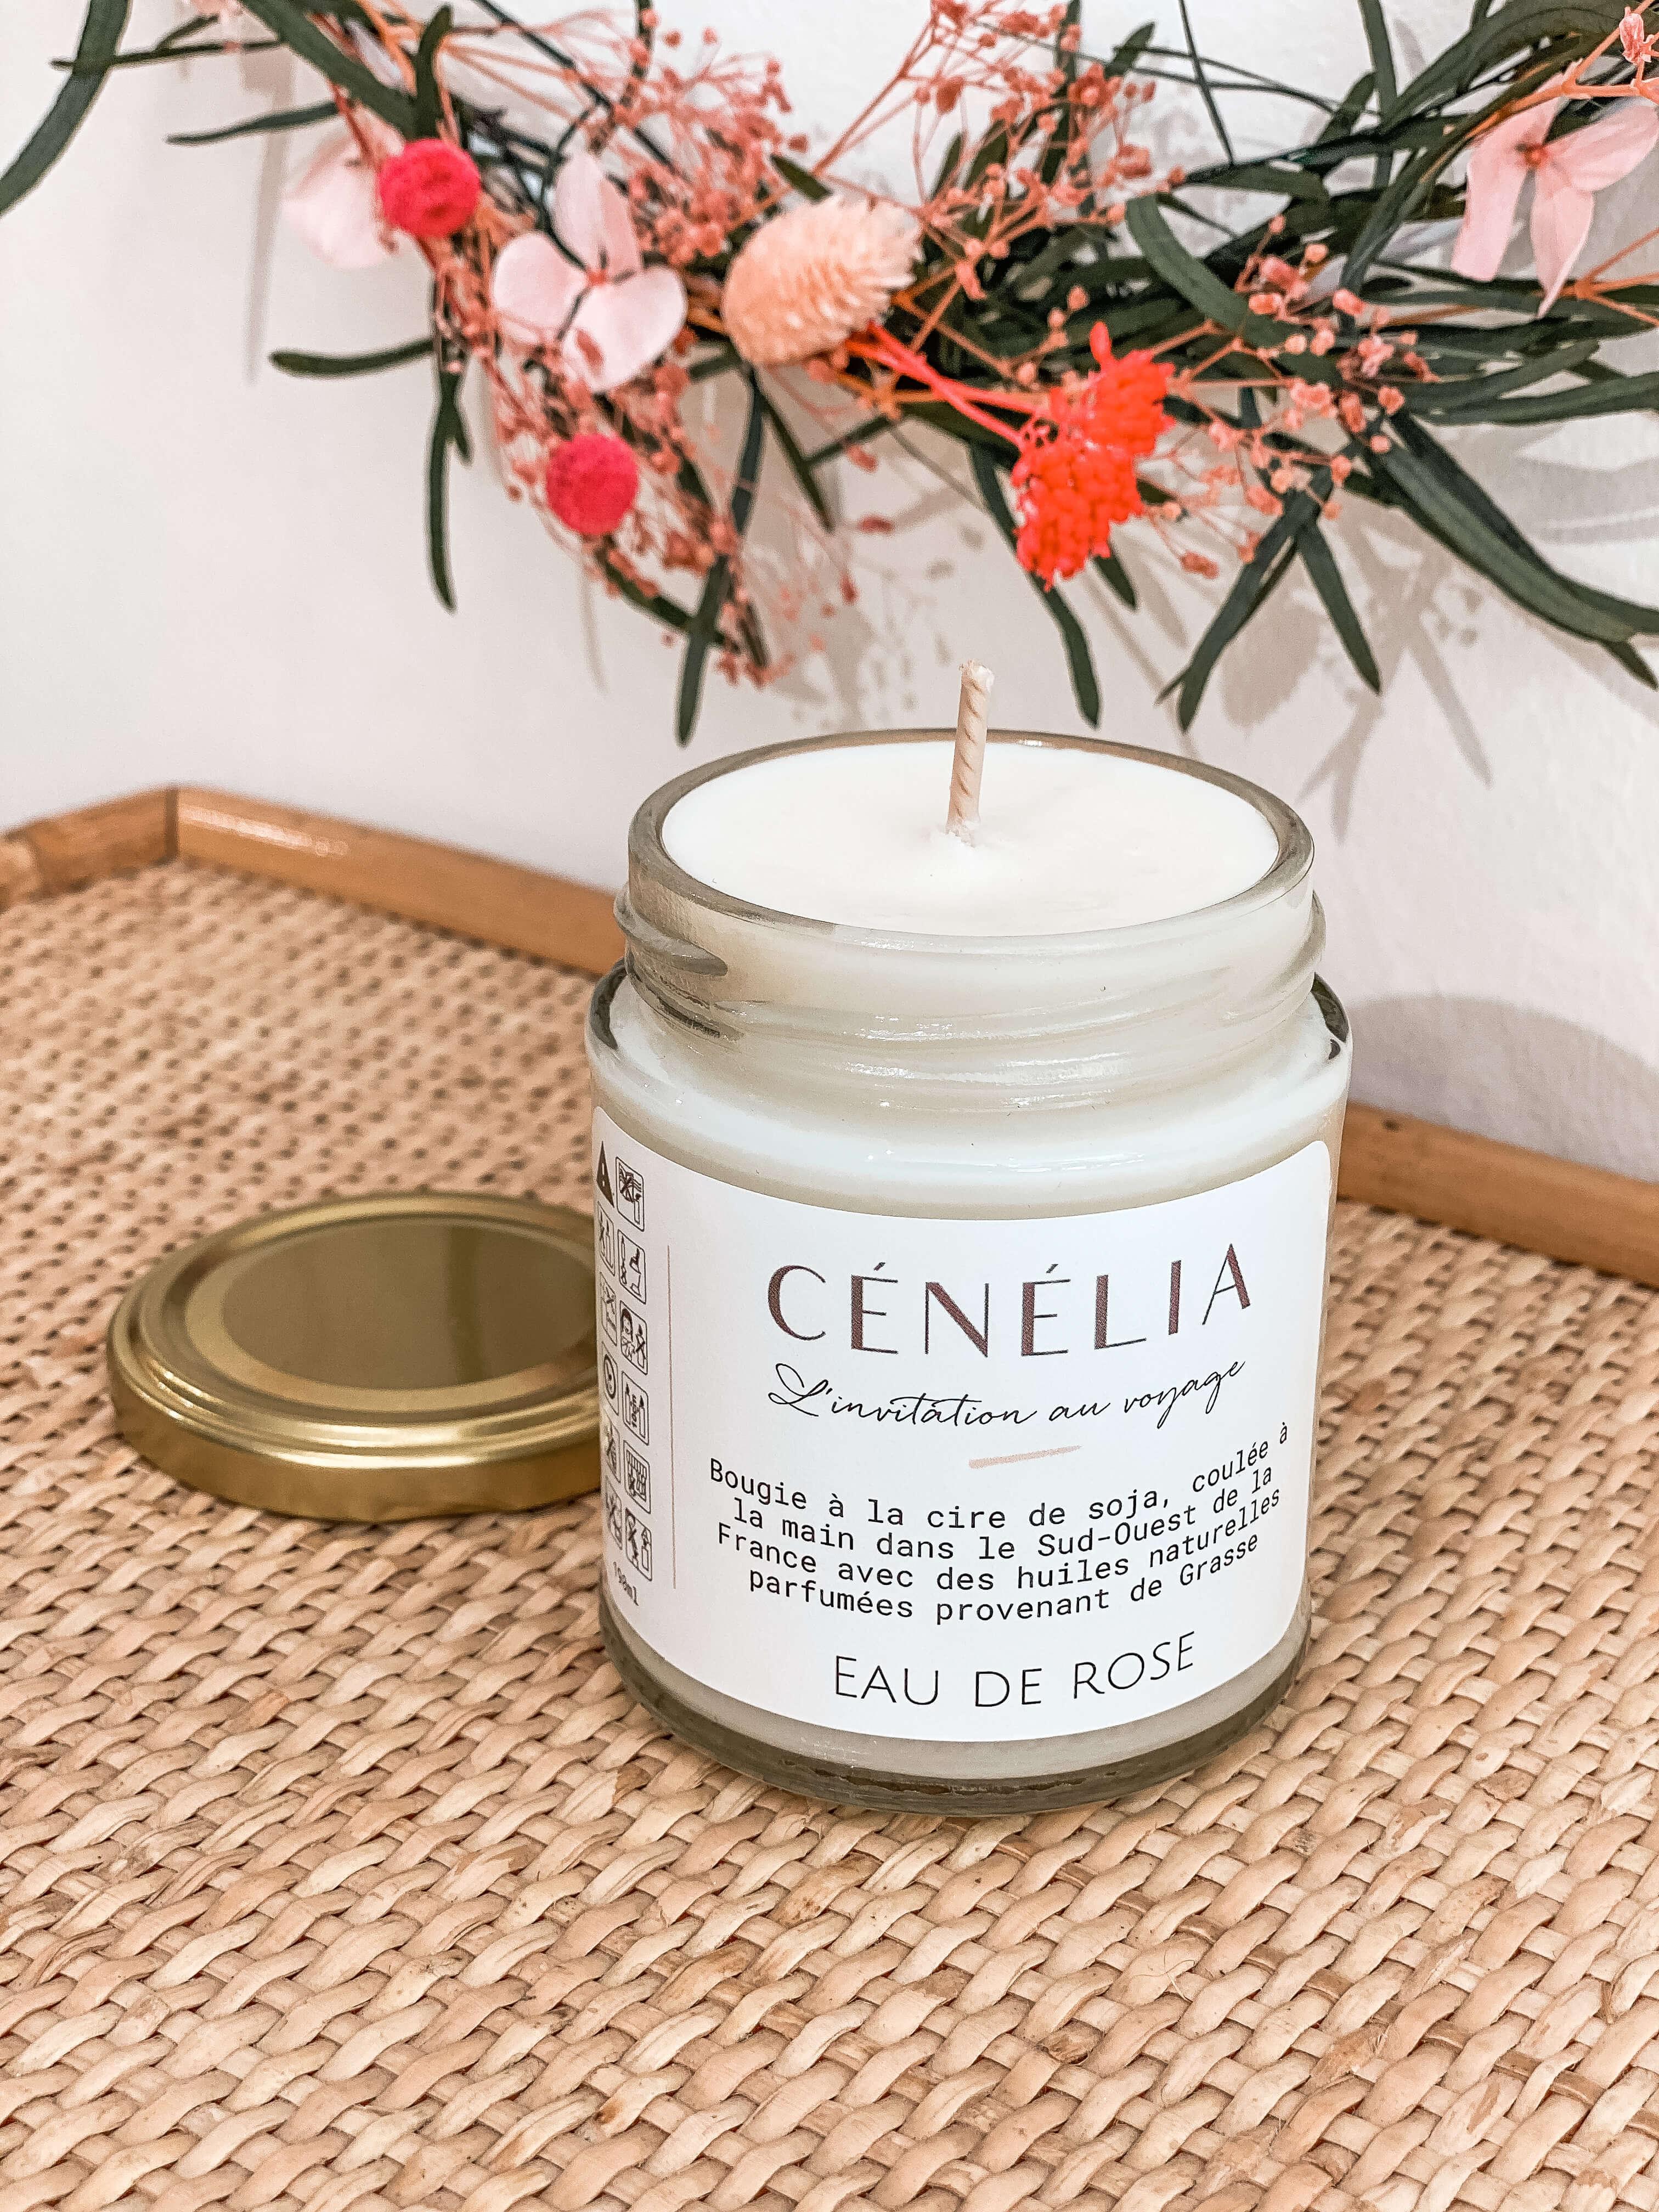 Bougie à la rose Cénélia - bougie naturelle cire de soja